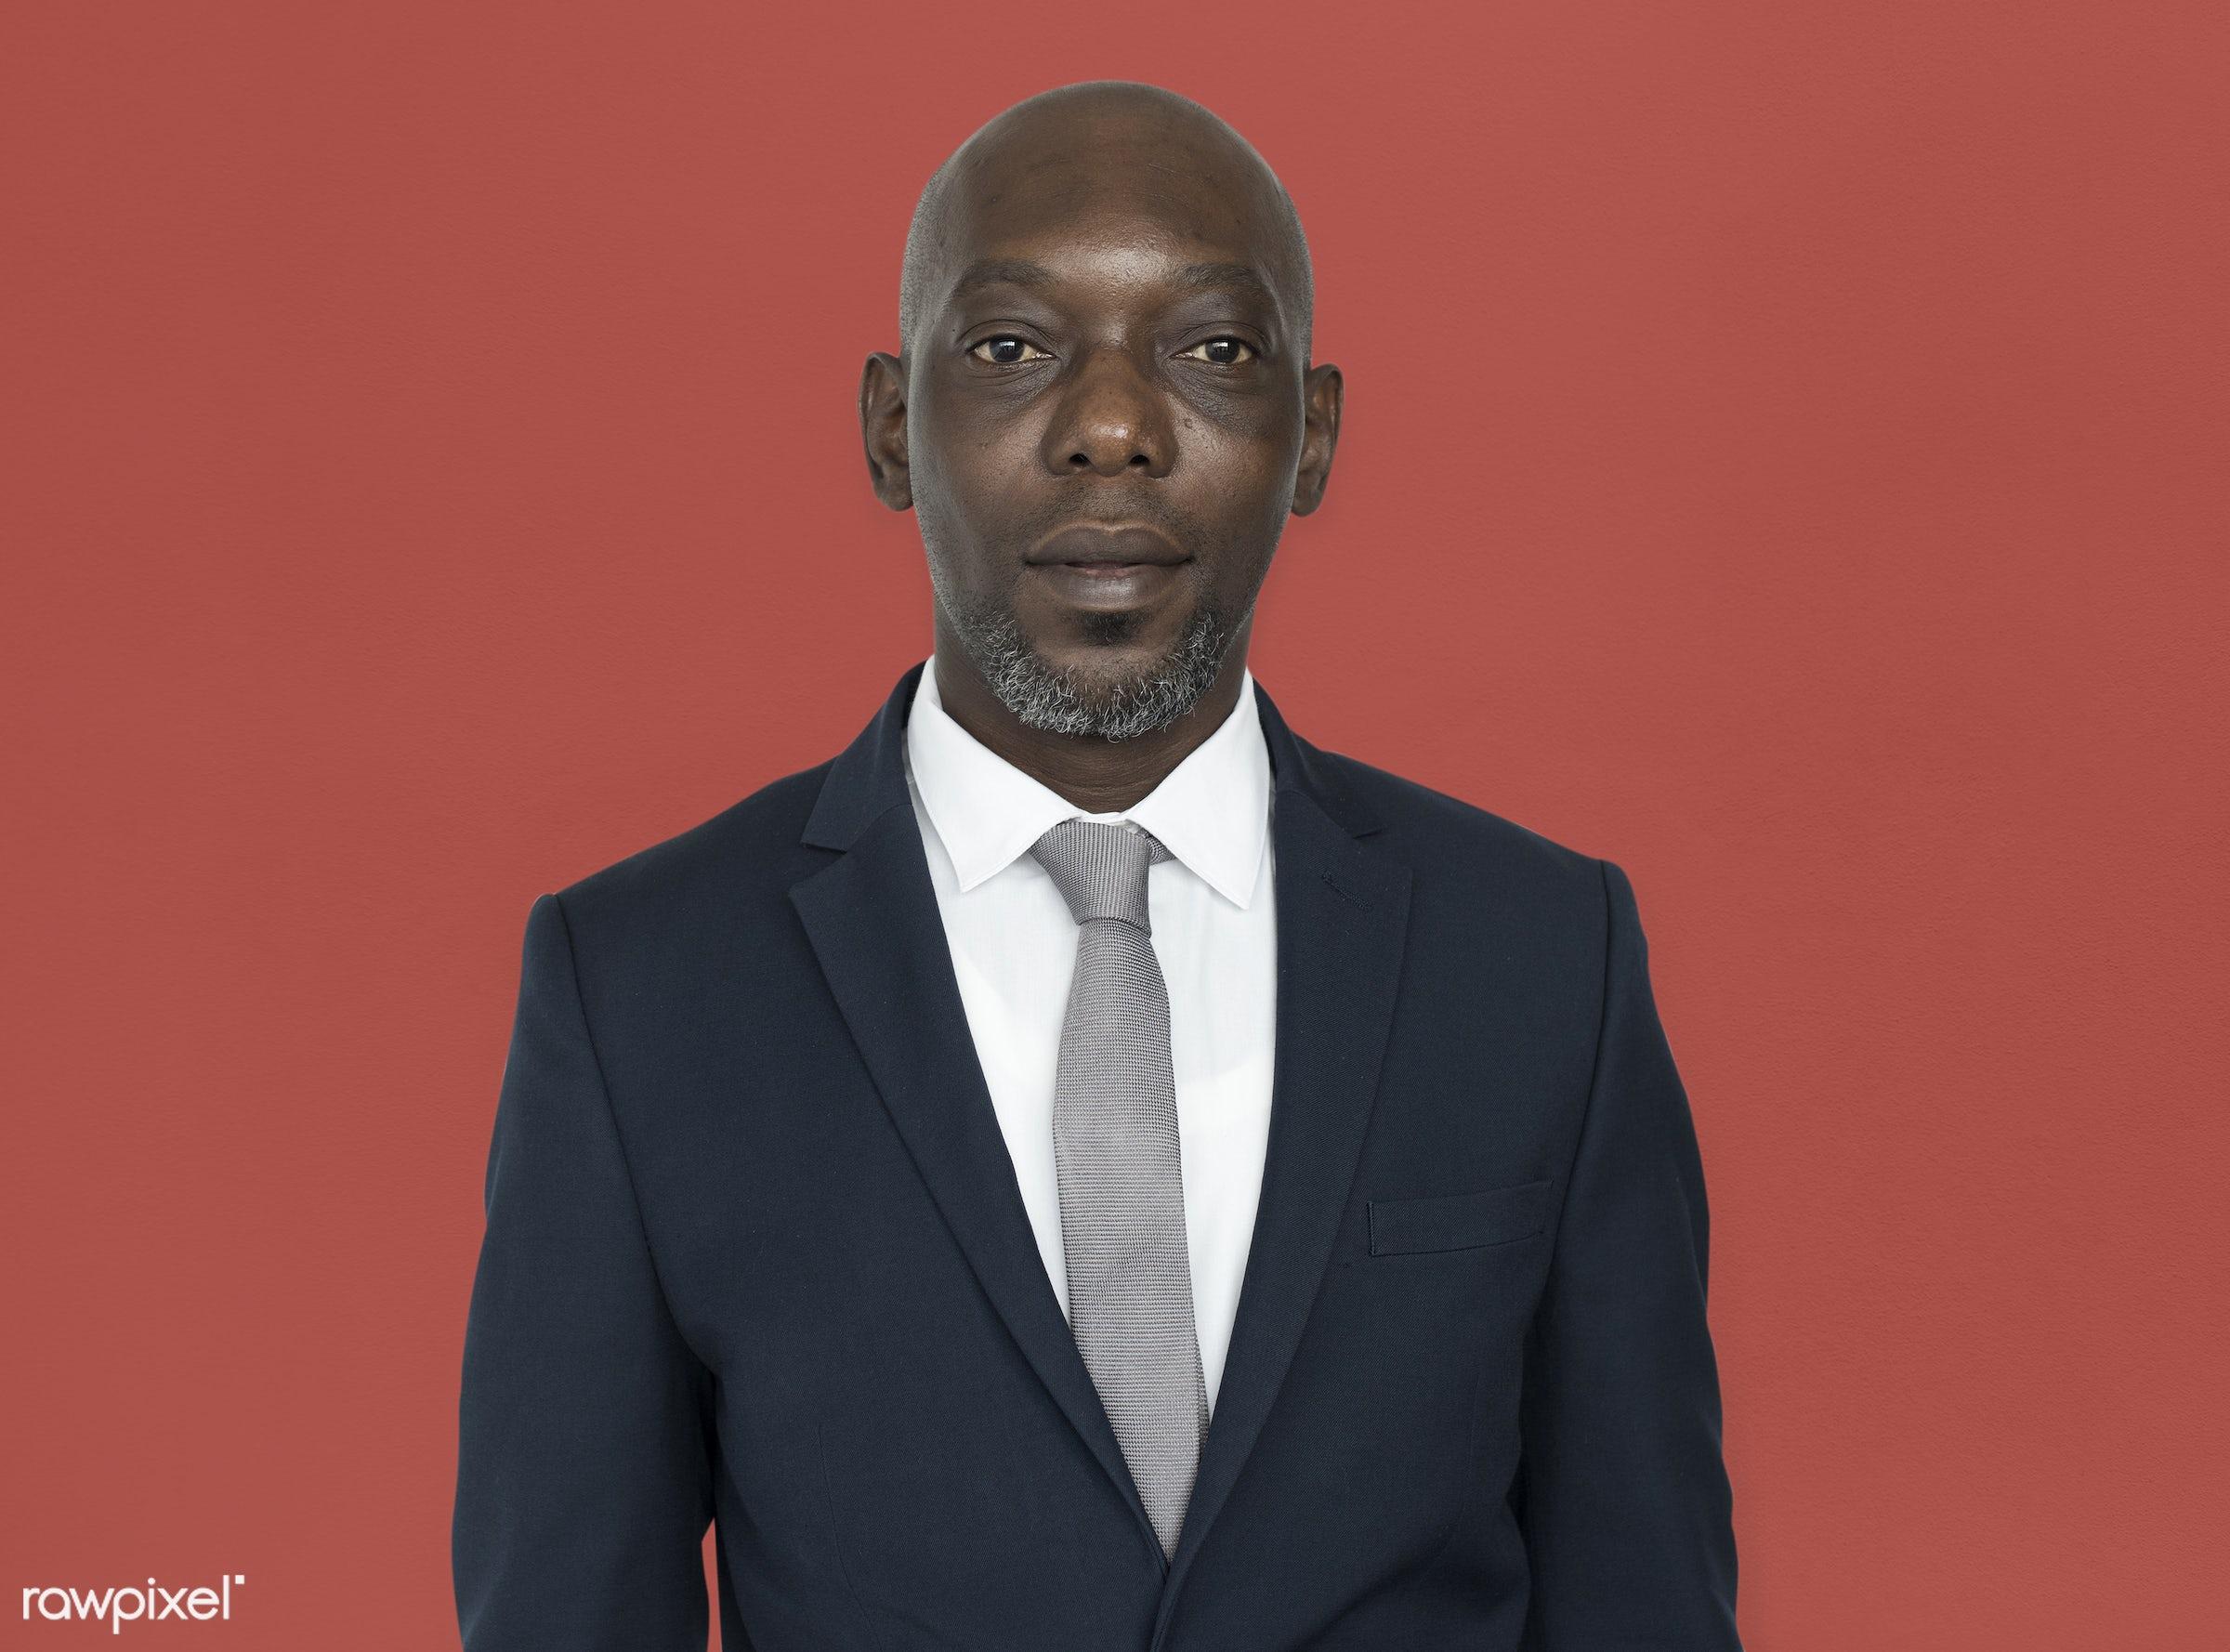 black, african, african american, man, male, portrait, professional, business, businessman, suit, tie